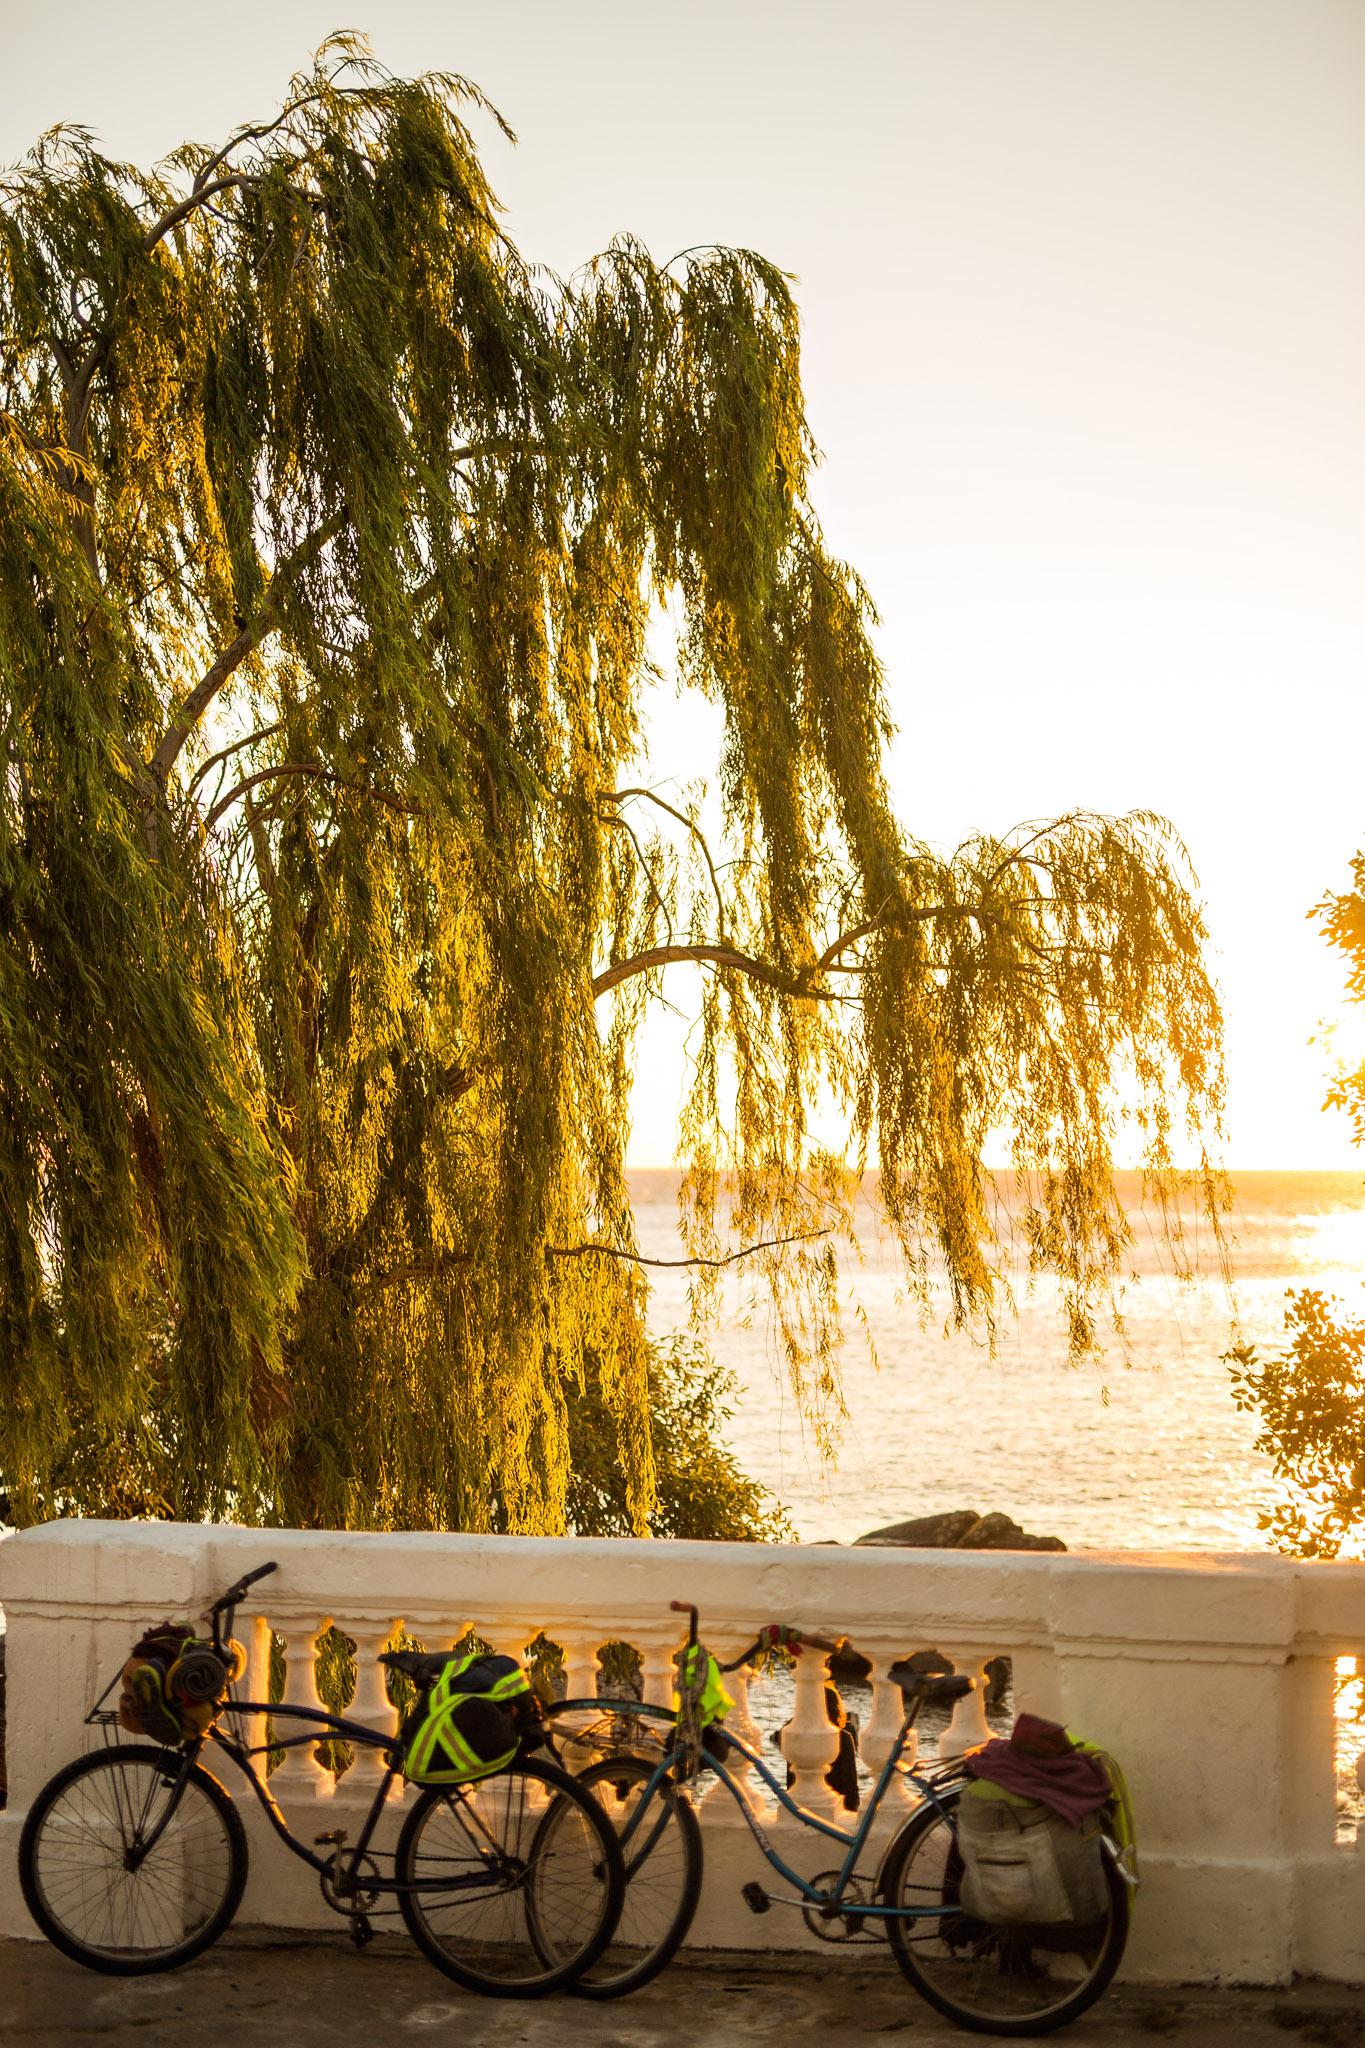 wedding-travellers-destination-photography-overlanding-south-america-uruguay-colonia-del-sacramento-sunset-river